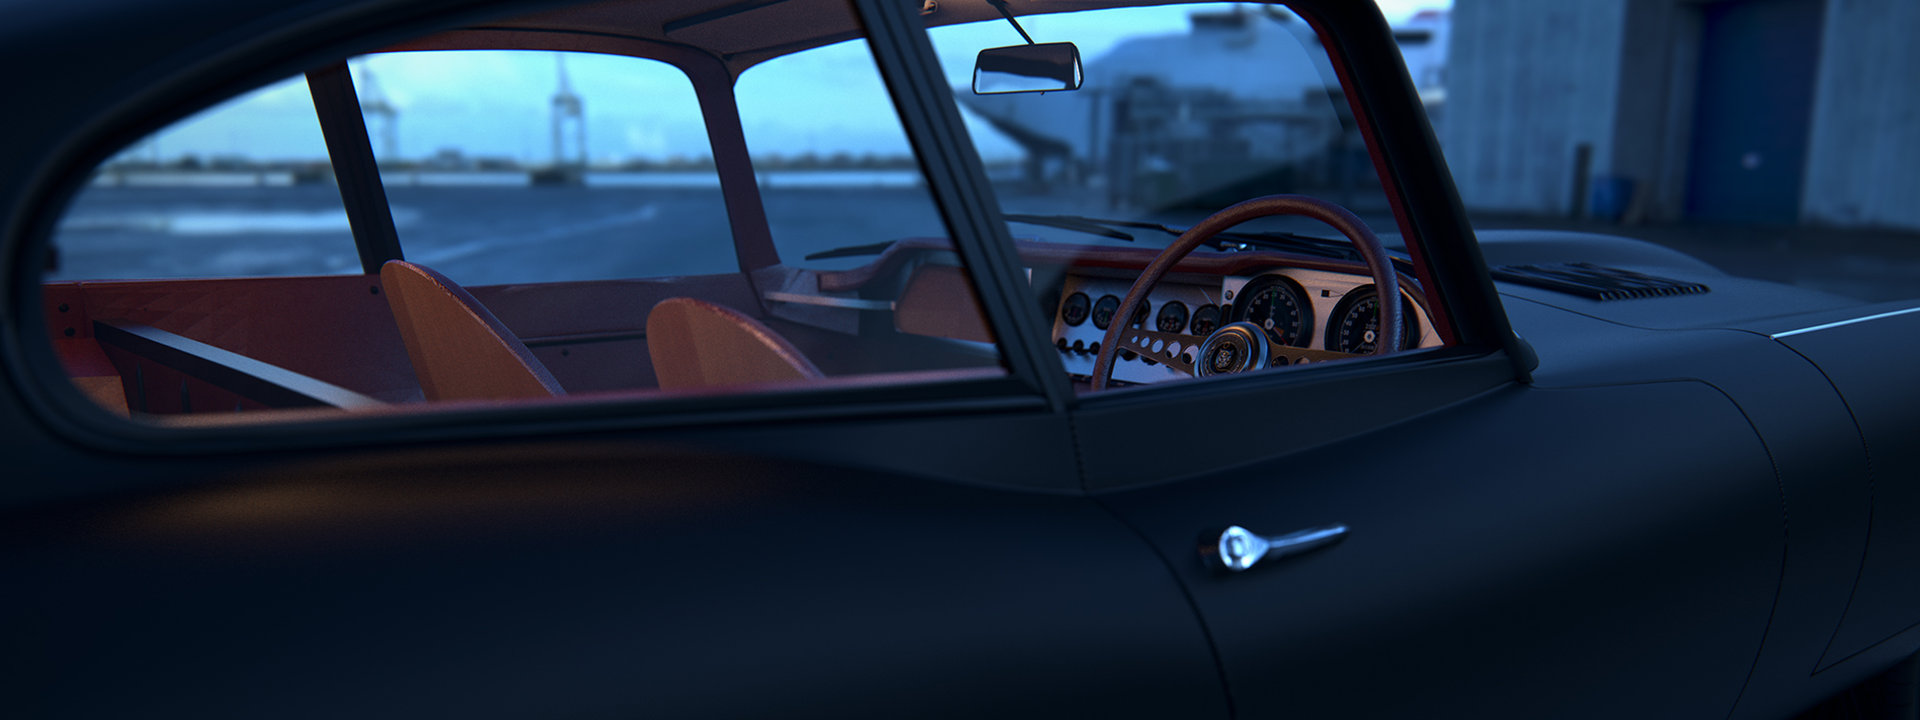 Michael marcondes blkup03 jaguar 1961 e type s1 3